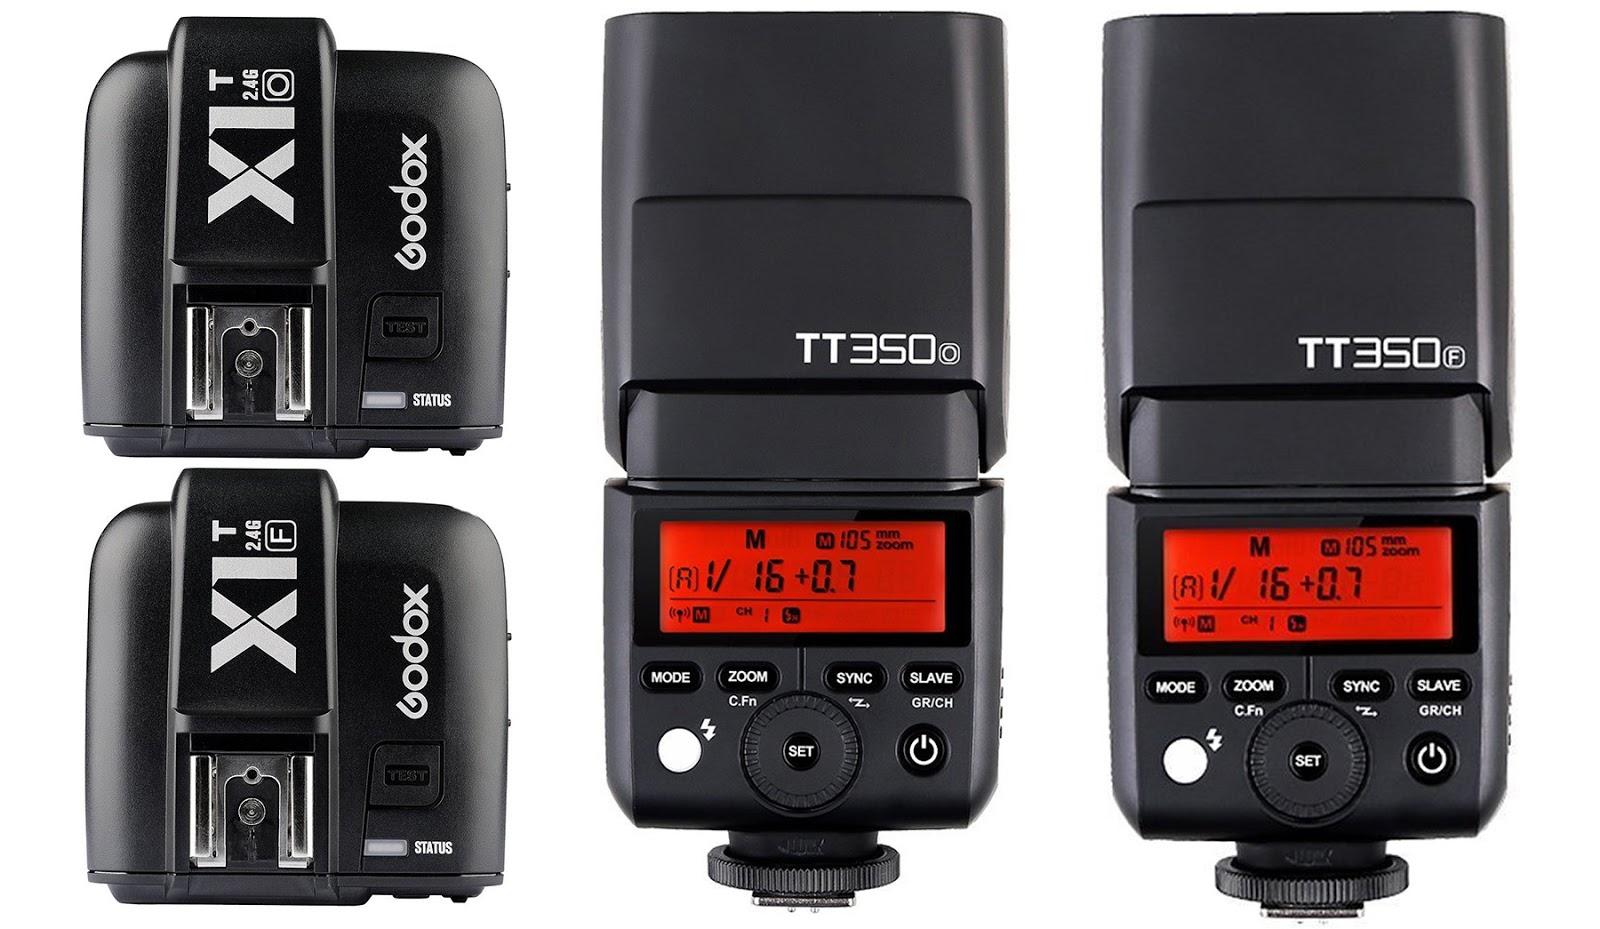 Синхронизаторы Godox X1T и вспышки TT350 для камер Fujifilm, Olympus и Panasonic